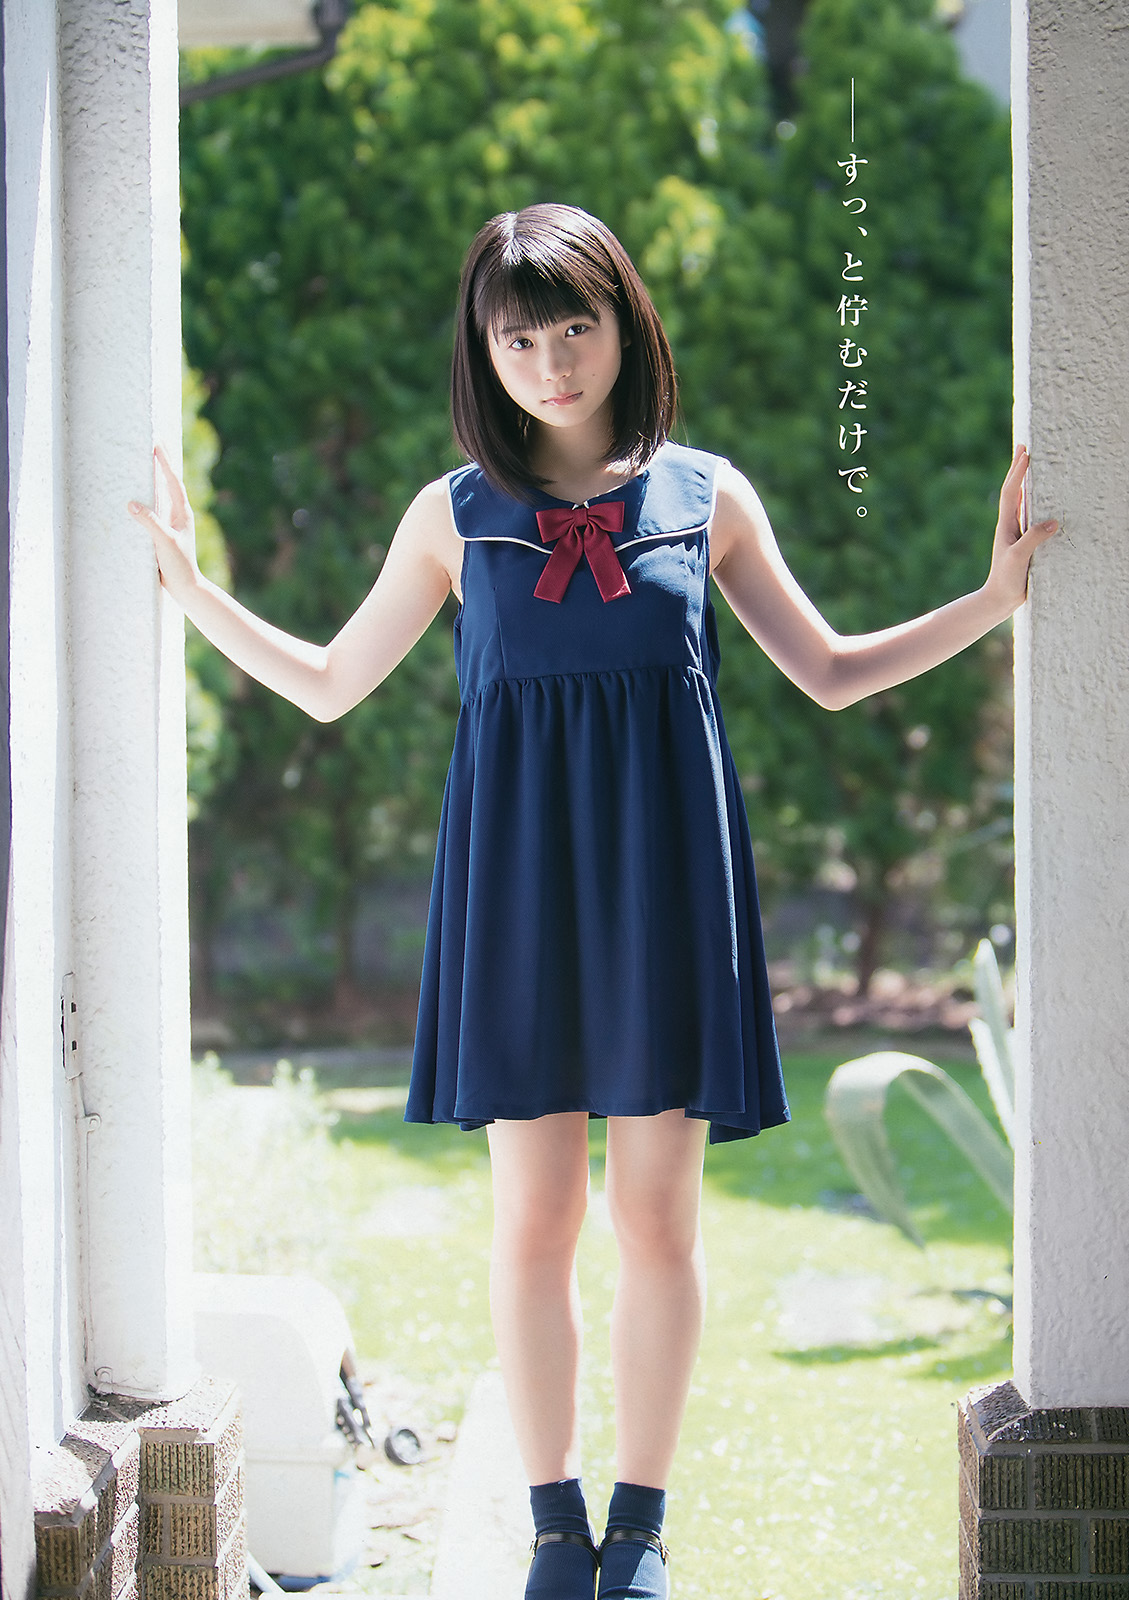 Obata Yuna 小畑優奈 SKE48, Young Animal 2017.06.09 No.11 (ヤングアニマル 2017年11号)